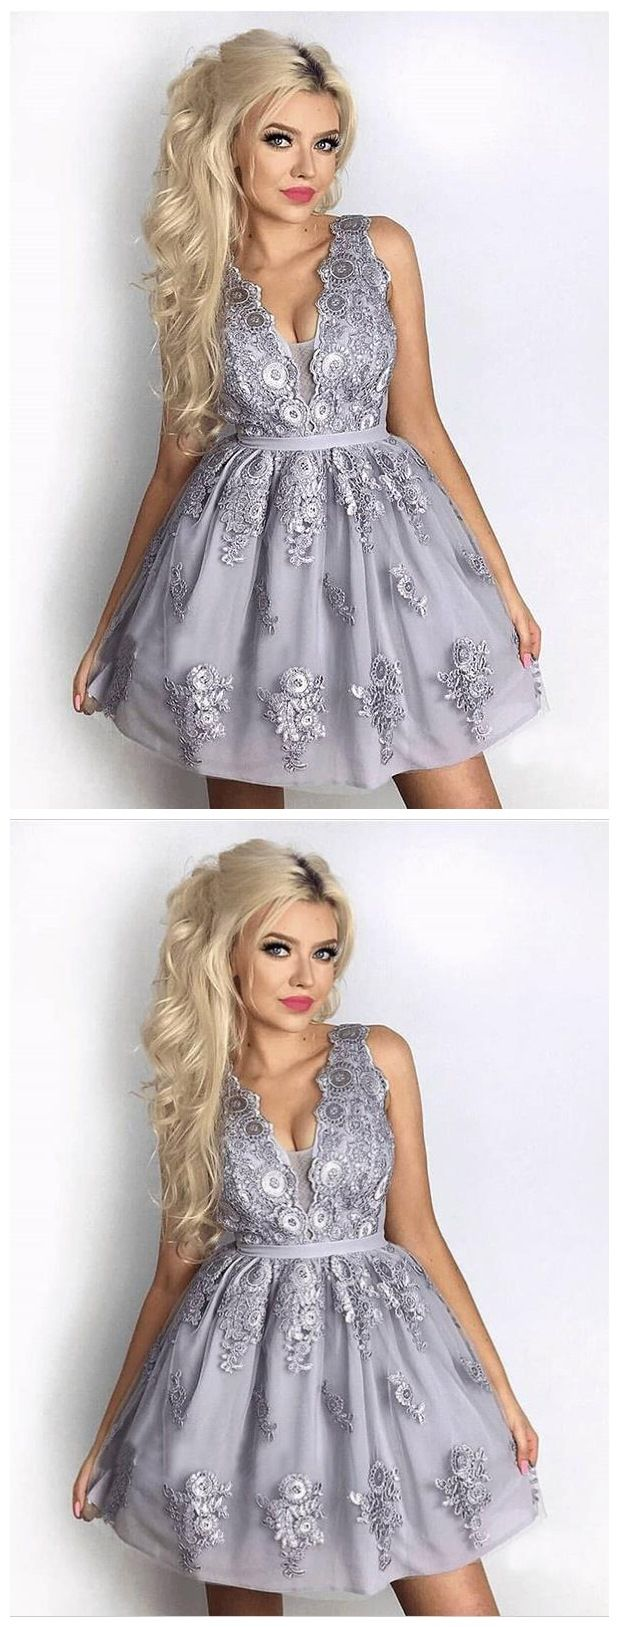 43ec4b17b6 Silver Grey Lace Appliqued Homecoming Dresses V Neck Cheap Short ...